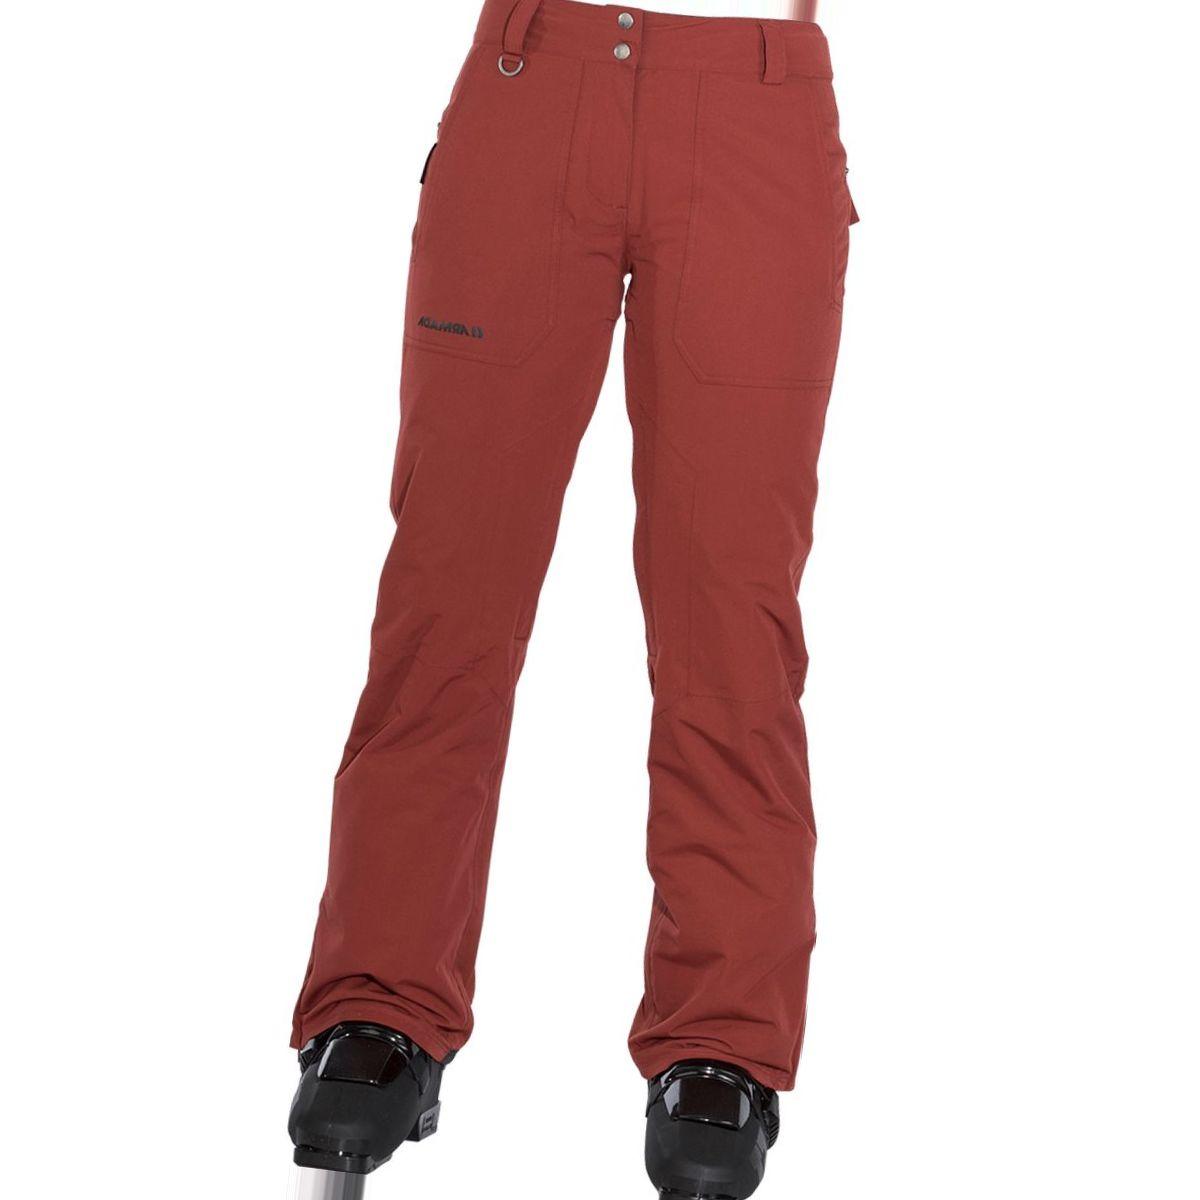 Armada Lenox Insulated Pant - Women's